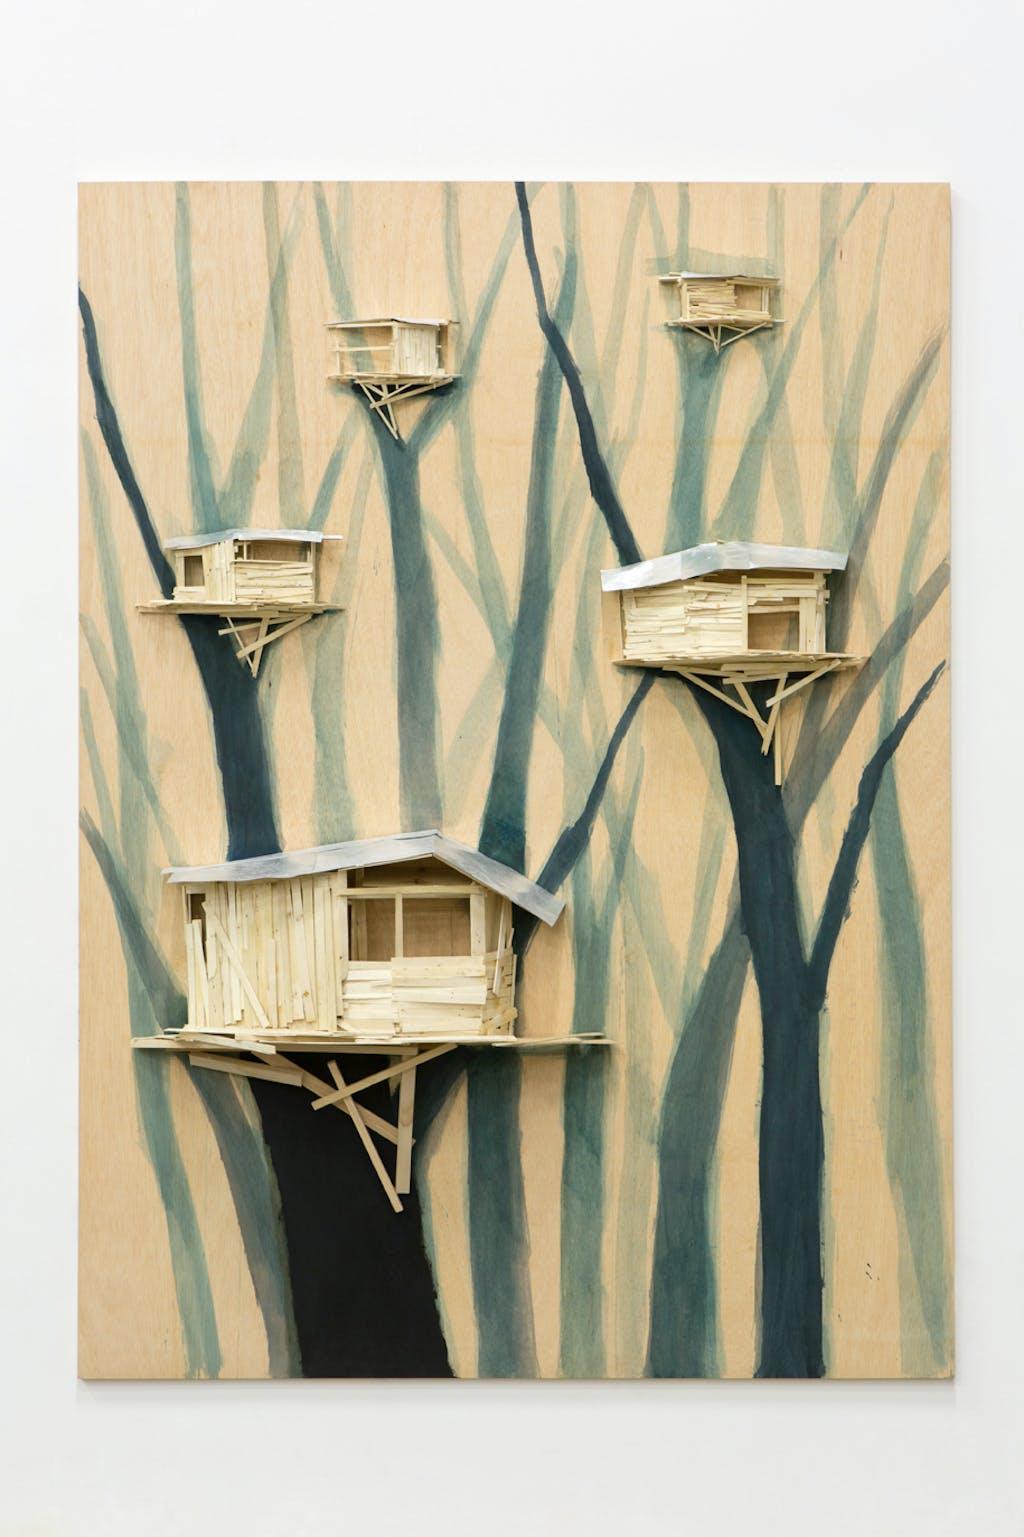 Tree hut group n°2 - © kamel mennour